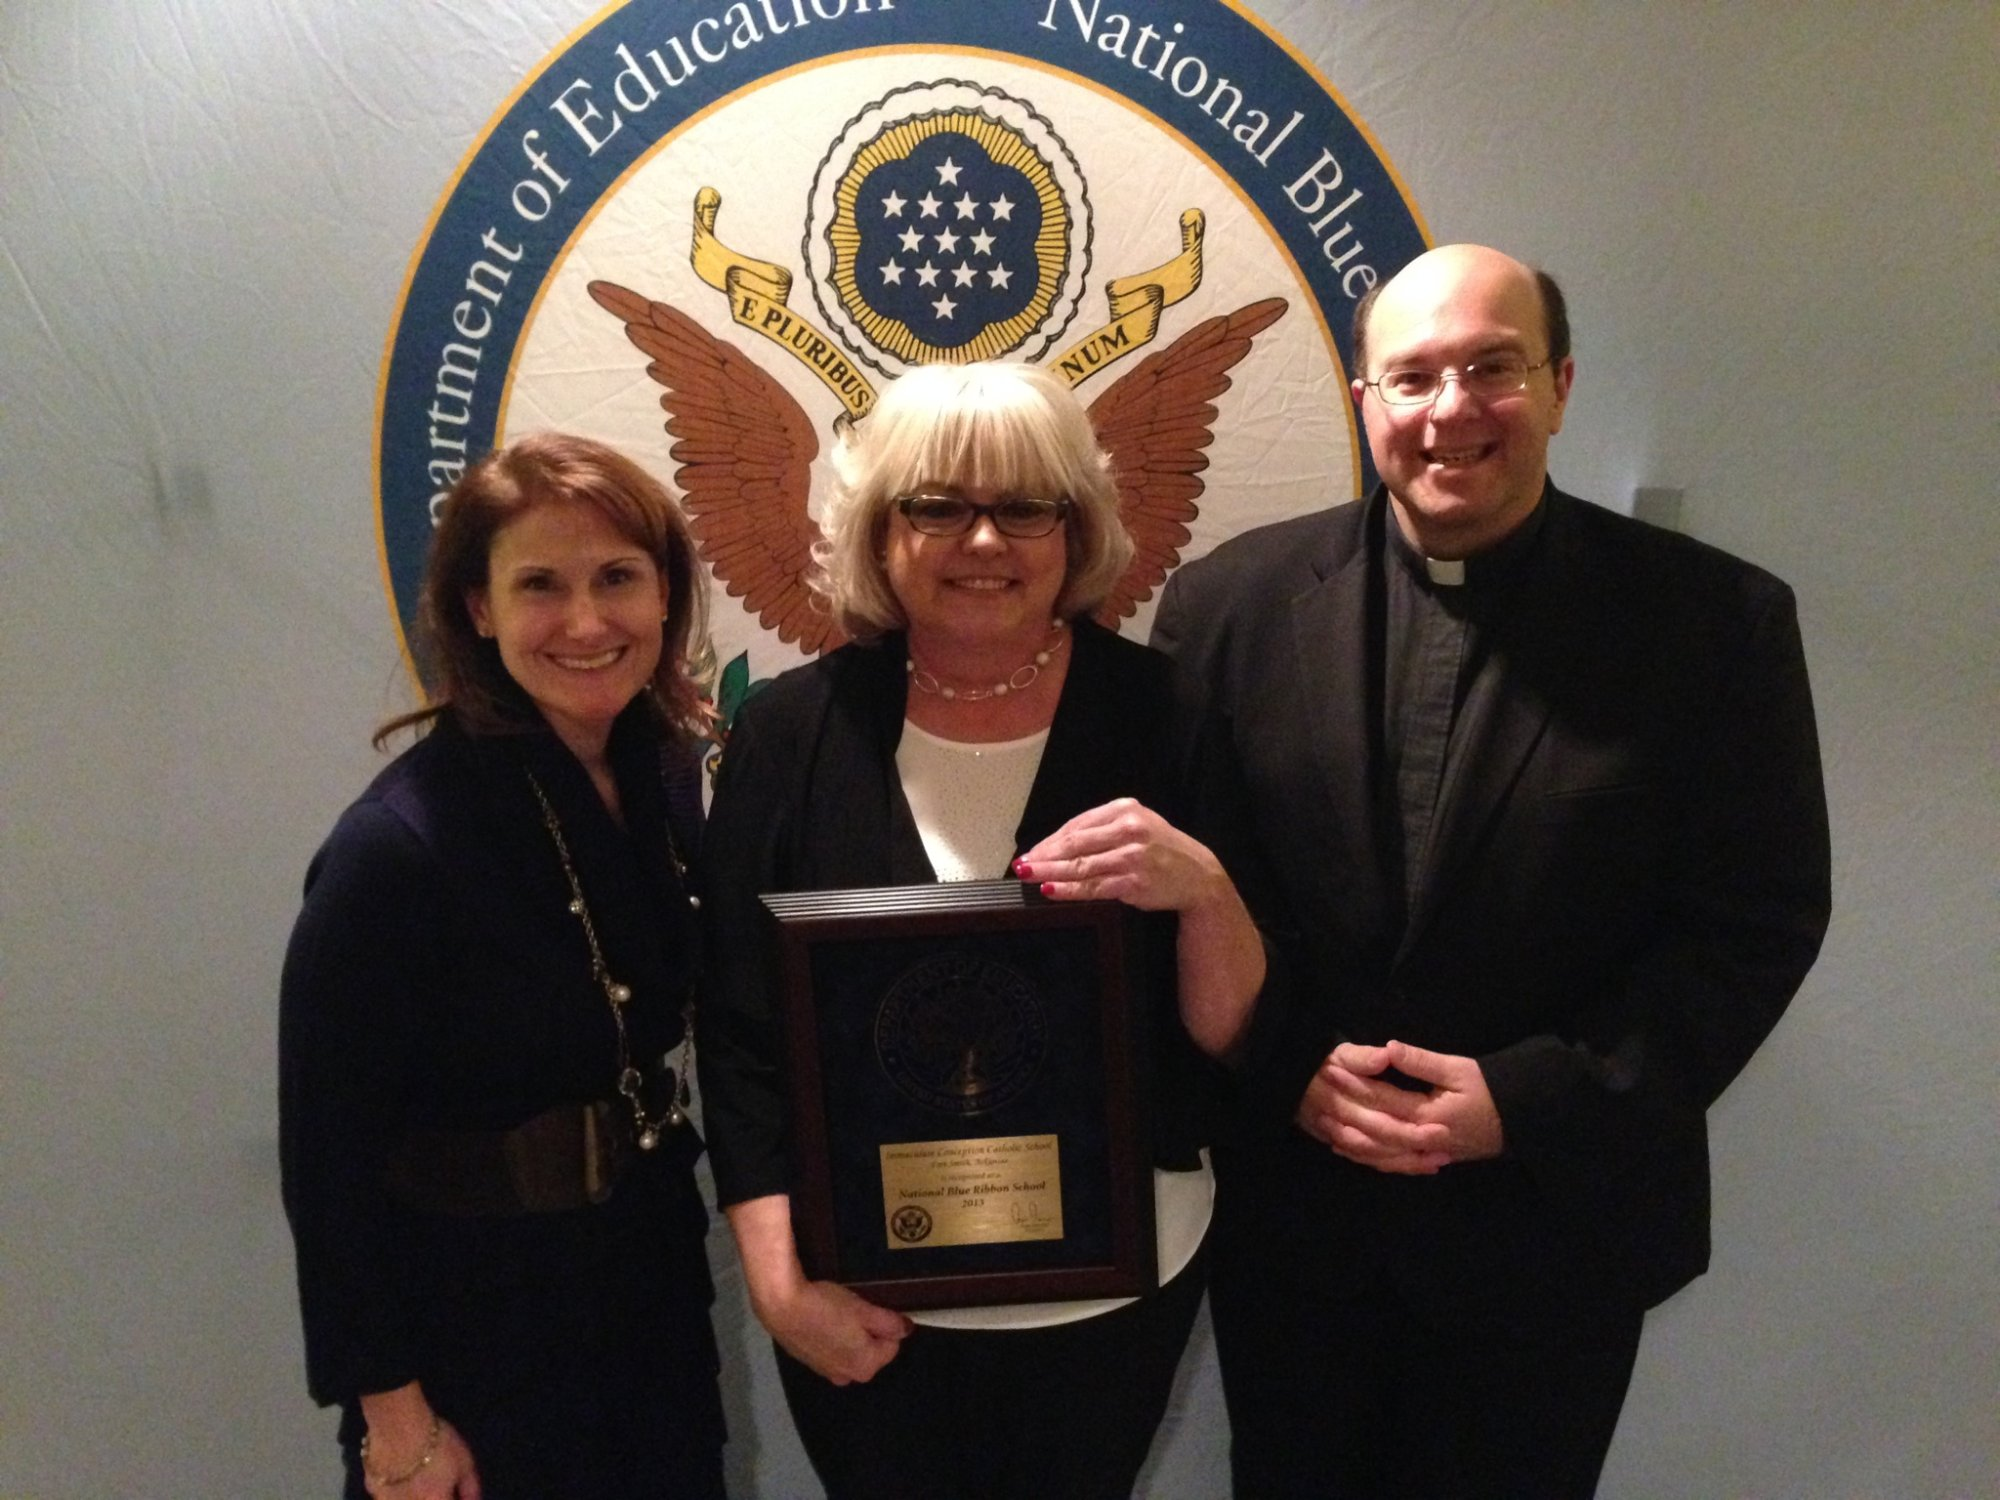 I.C. School Officials picking up National Blue Ribbon School Award.